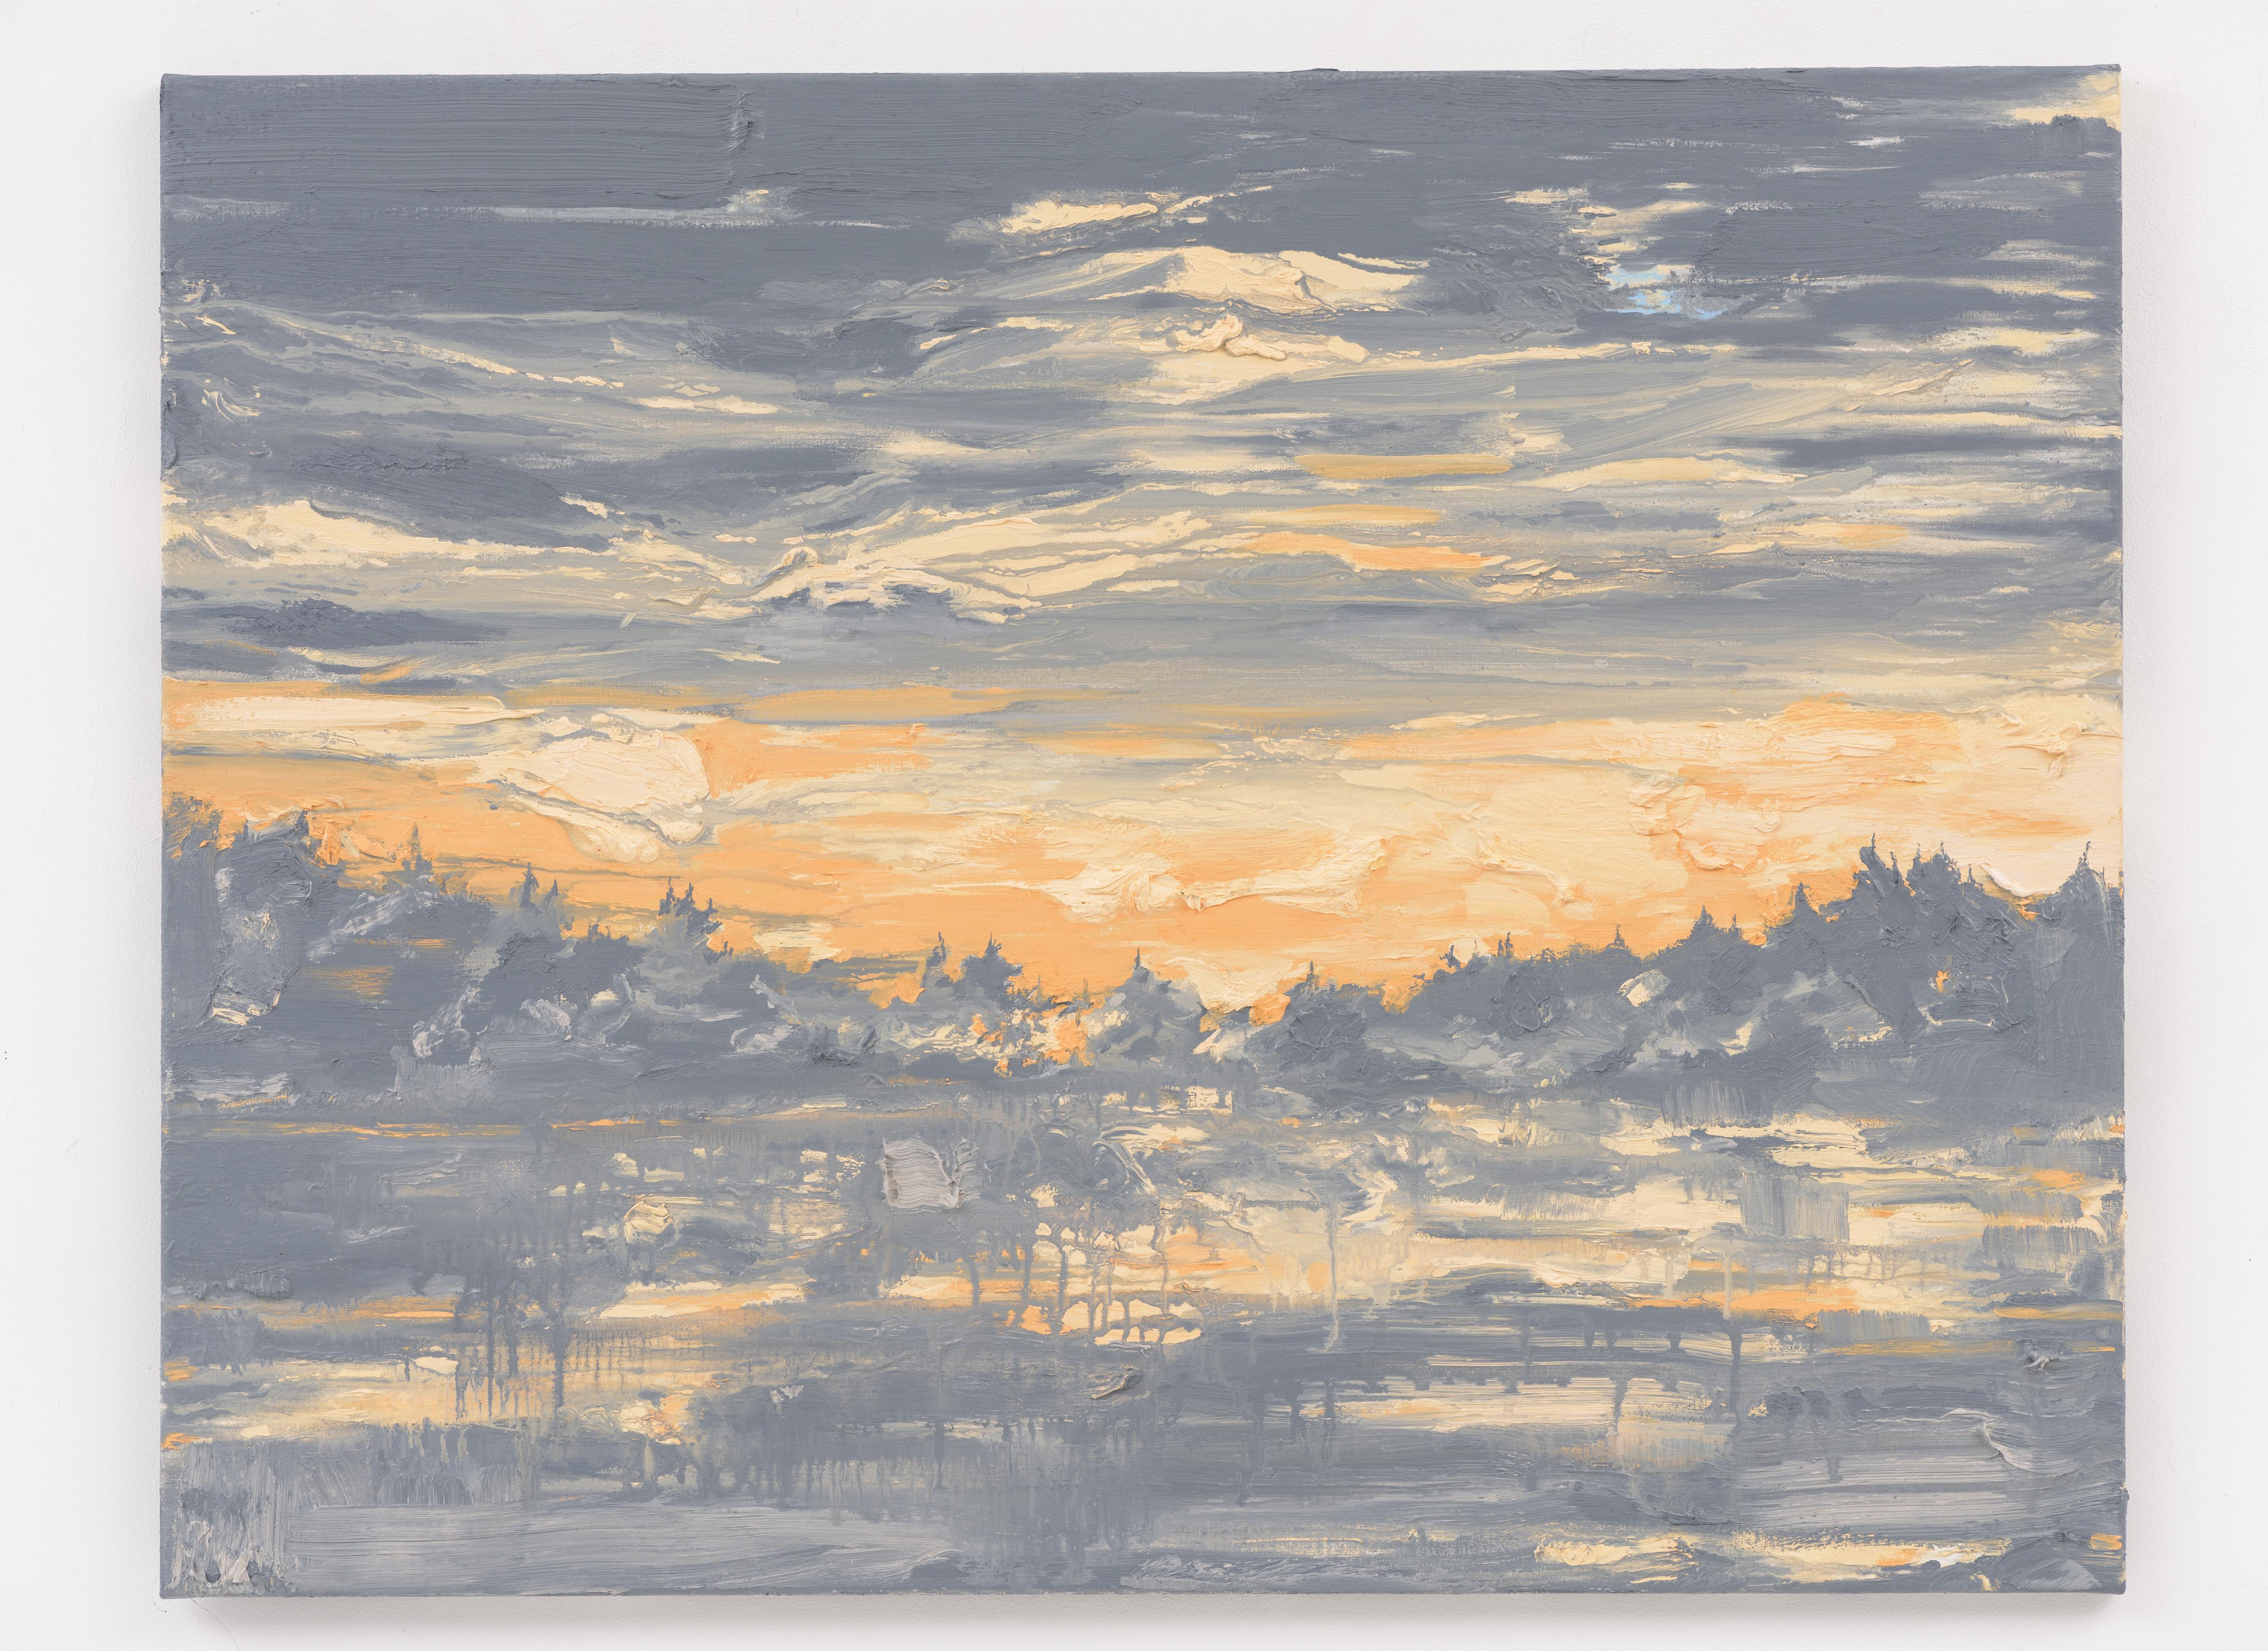 """Mirrored Waters II"" 70 x 90 cm. oil on linen 2016"